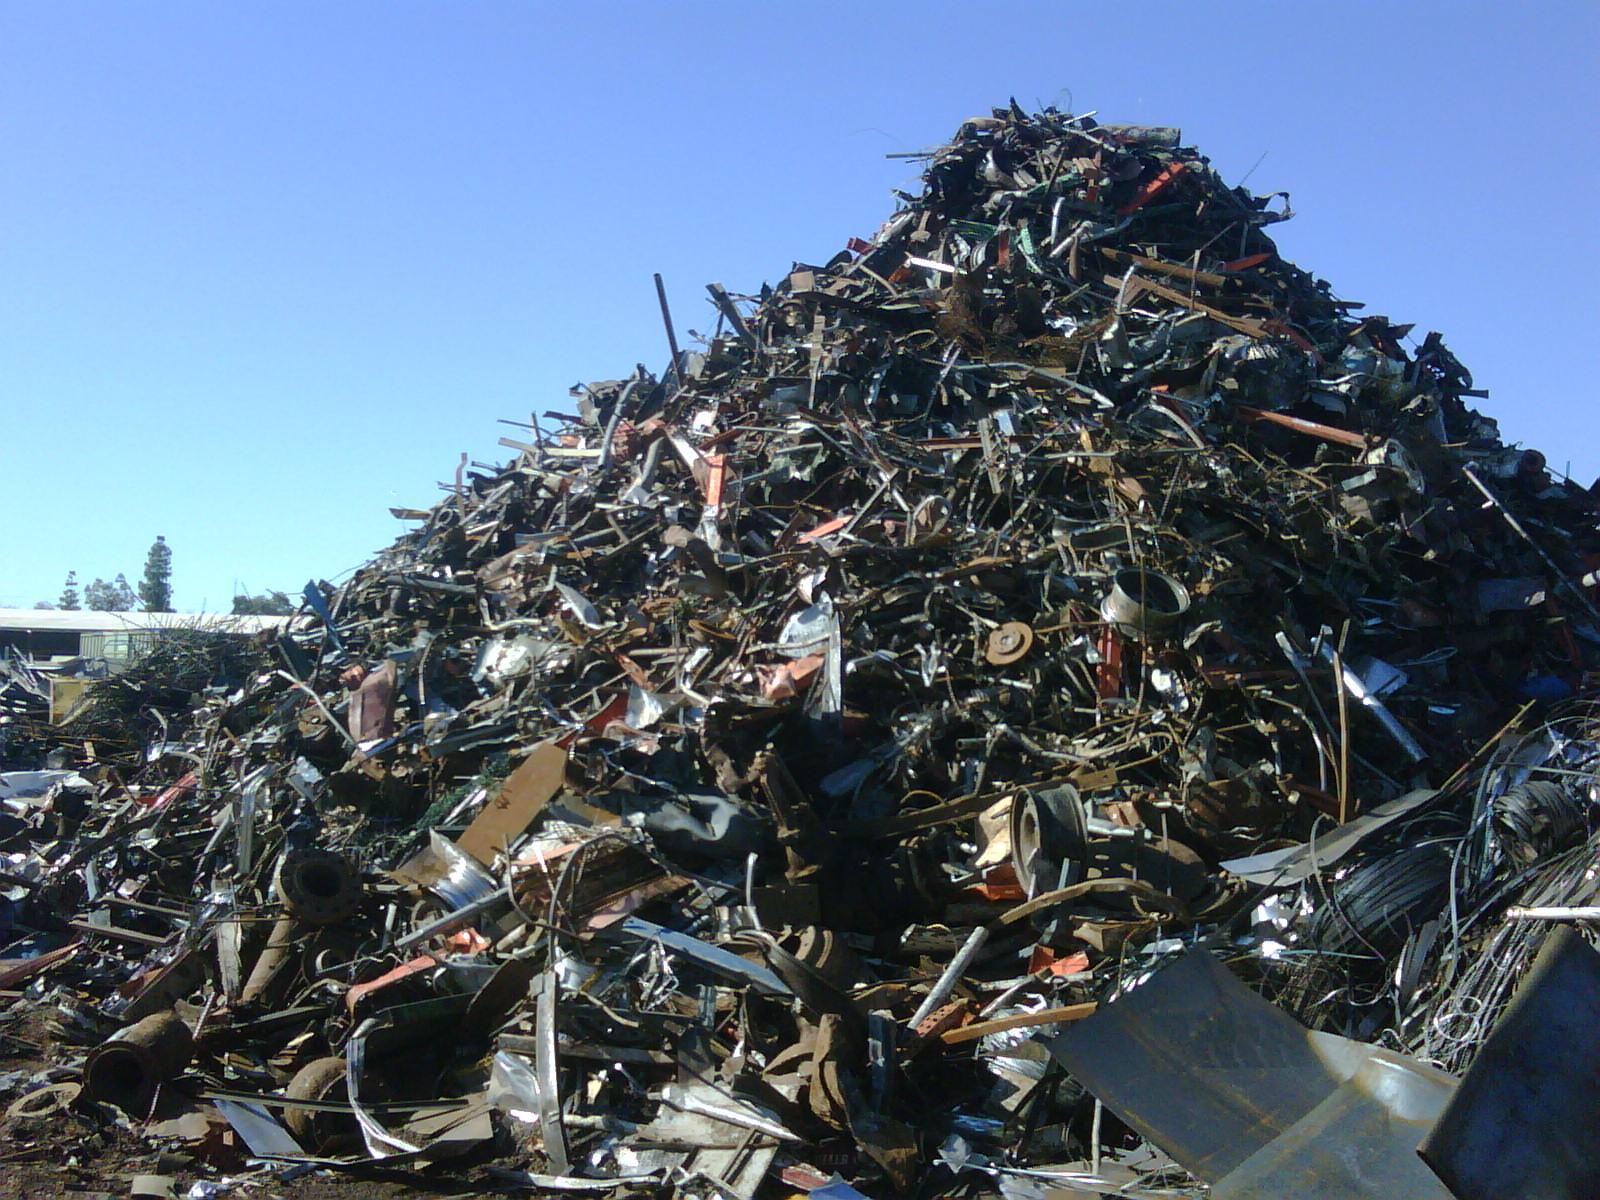 Scrap Metal Peoria, AZ | We Buy Scrap